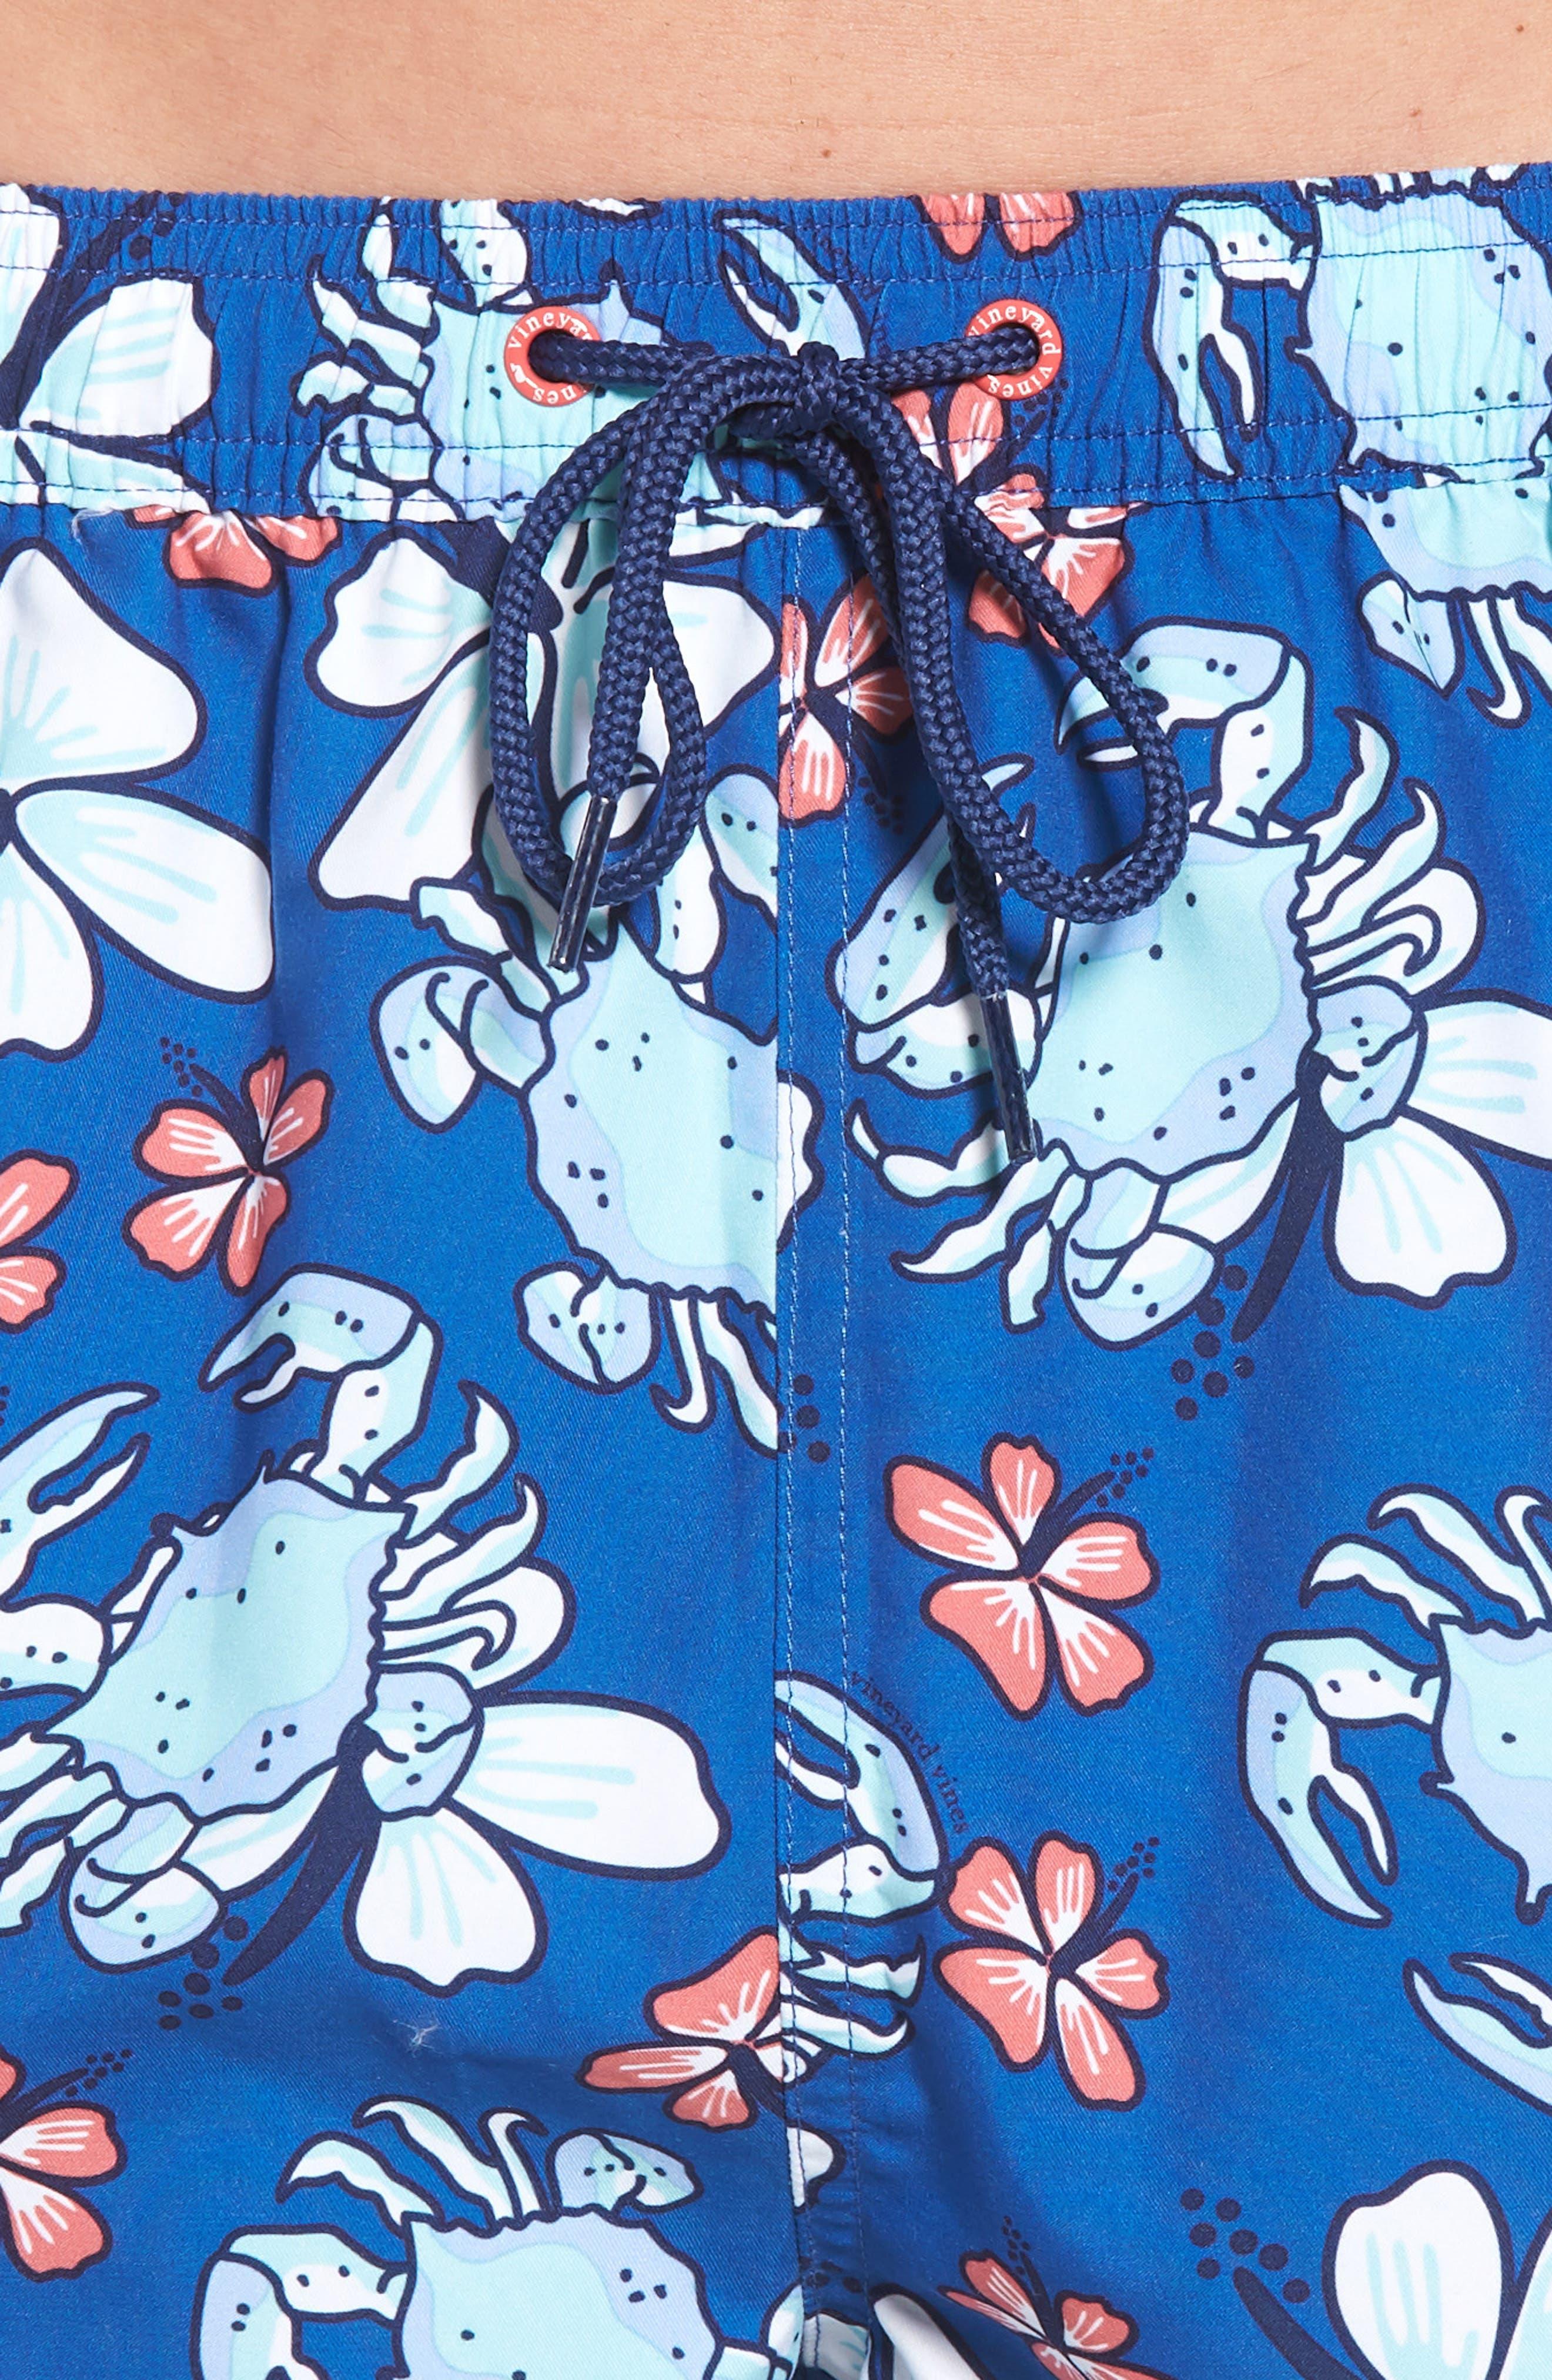 Chappy Crab Floral Swim Trunks,                             Alternate thumbnail 4, color,                             413